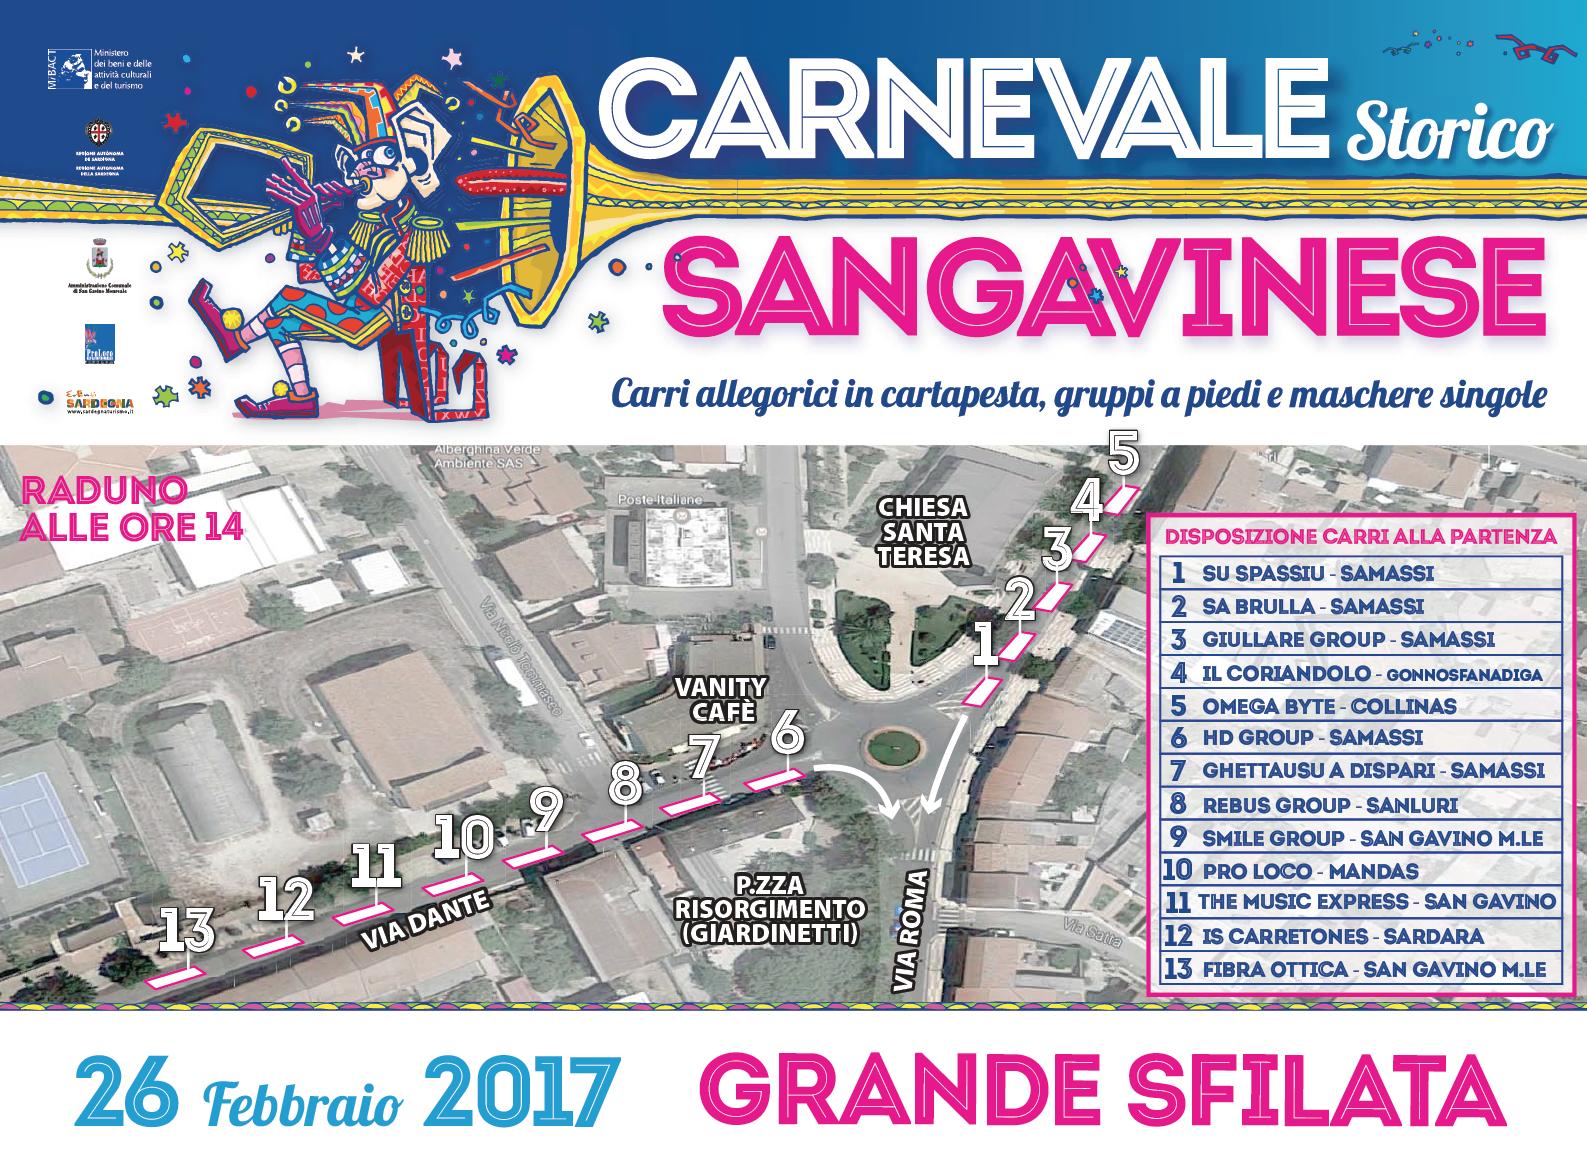 Carnevale2017_disposizione_carri